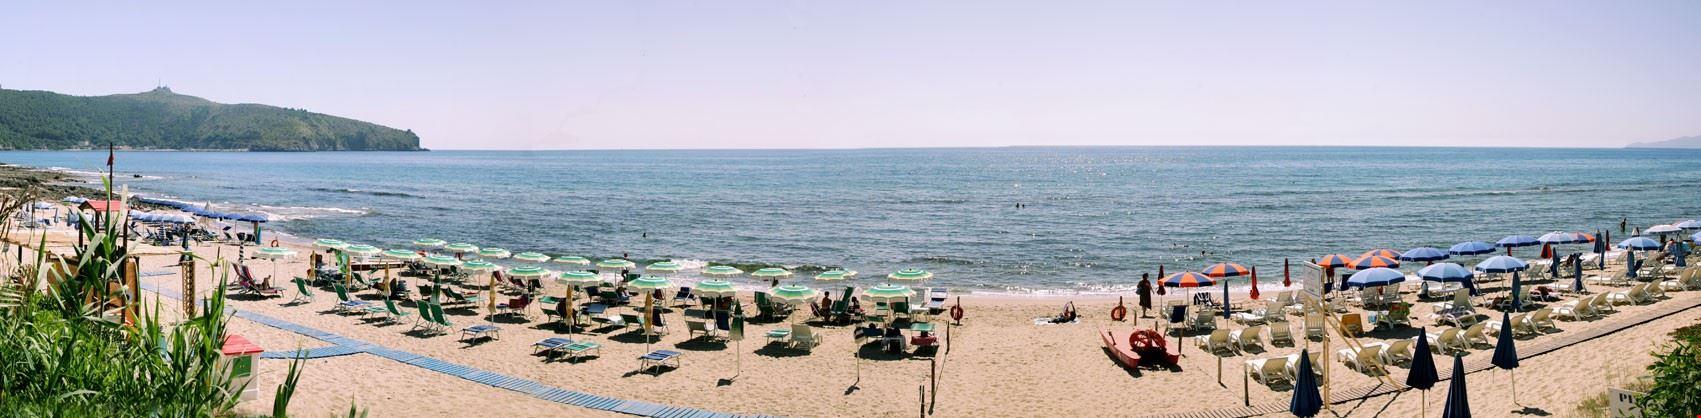 Camping Village sul Mare del Cilento